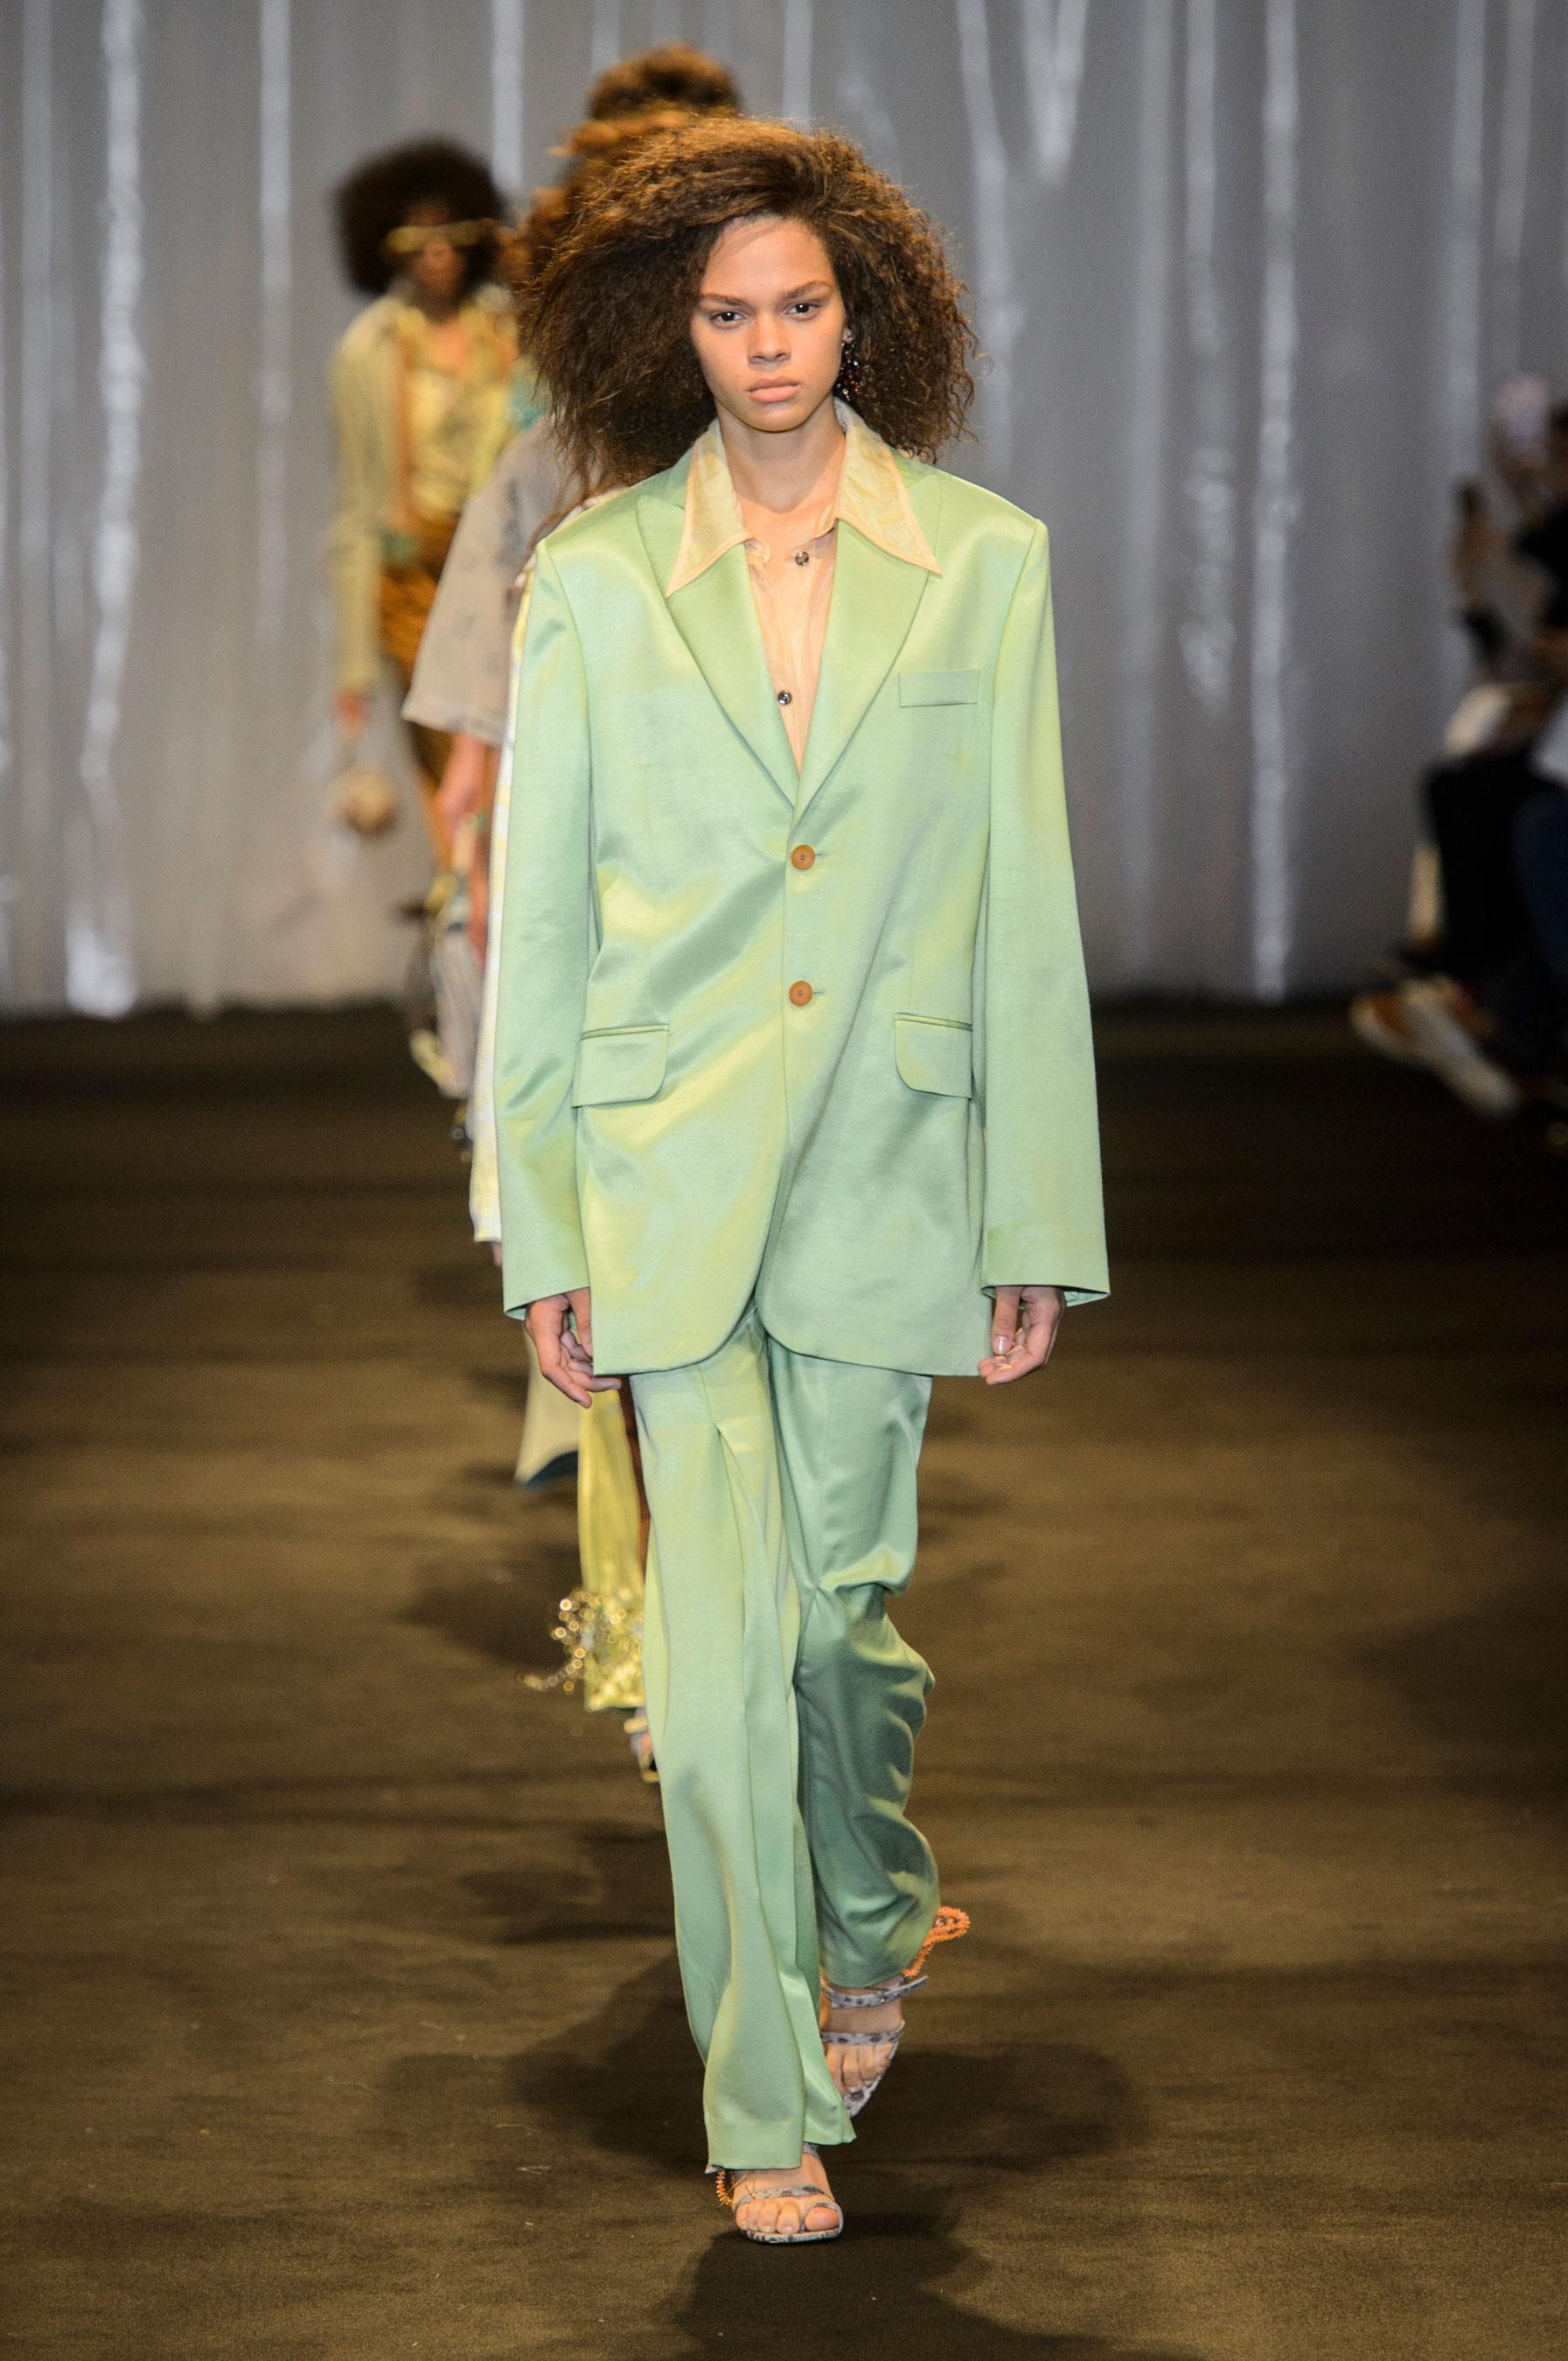 e72b012fbbf Défilé Acne Studios printemps-été 2018 Prêt-à-porter - Madame Figaro